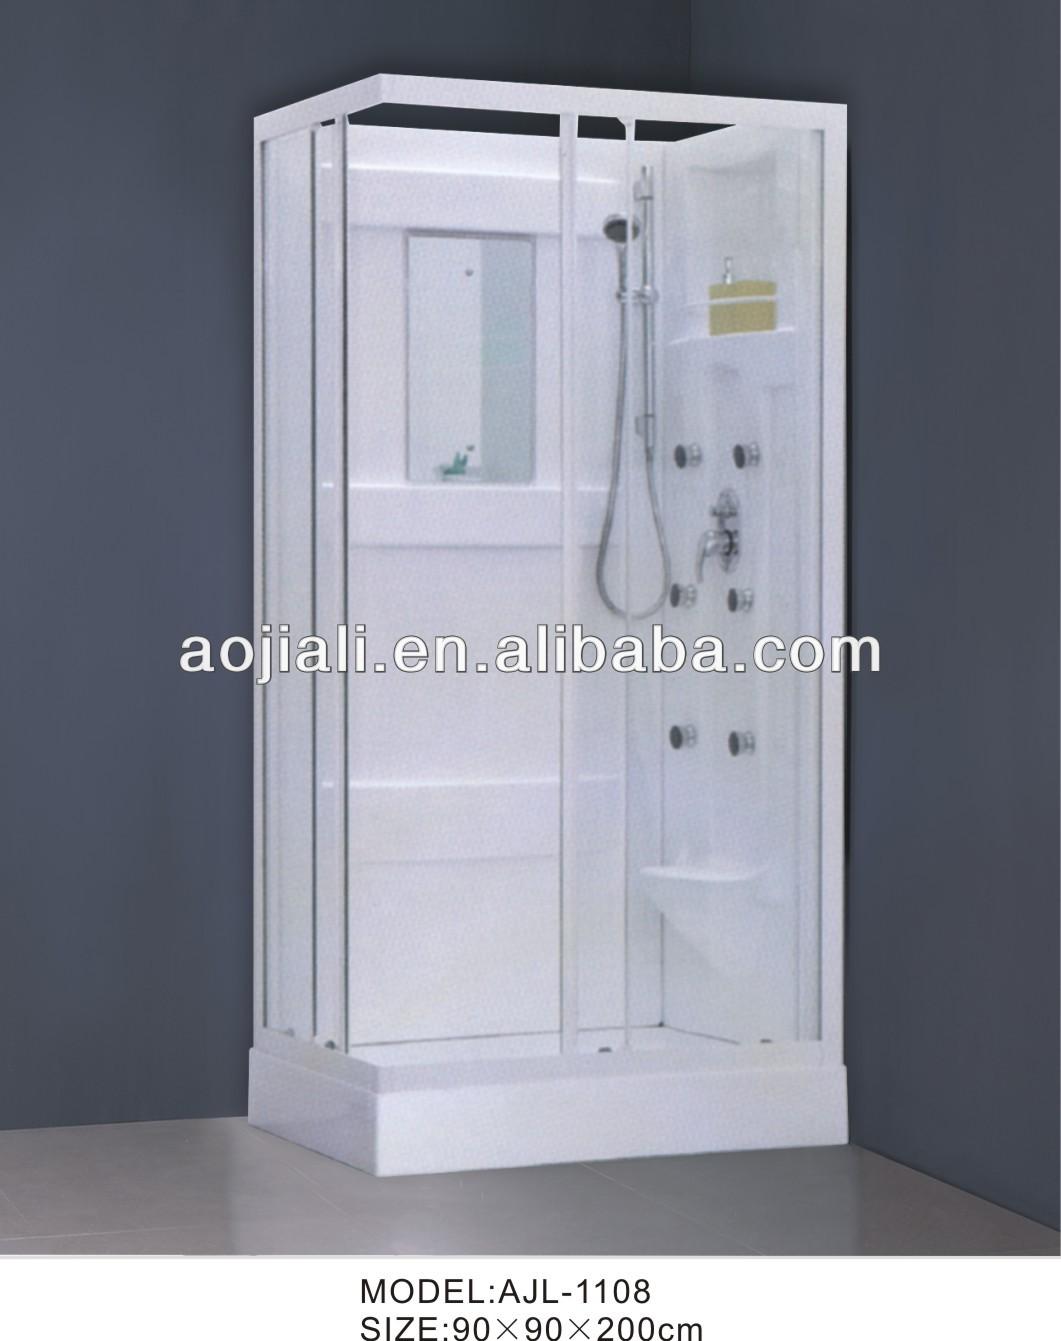 Temporary Shower Enclosures : Ajl simple portable shower enclosures cabinet